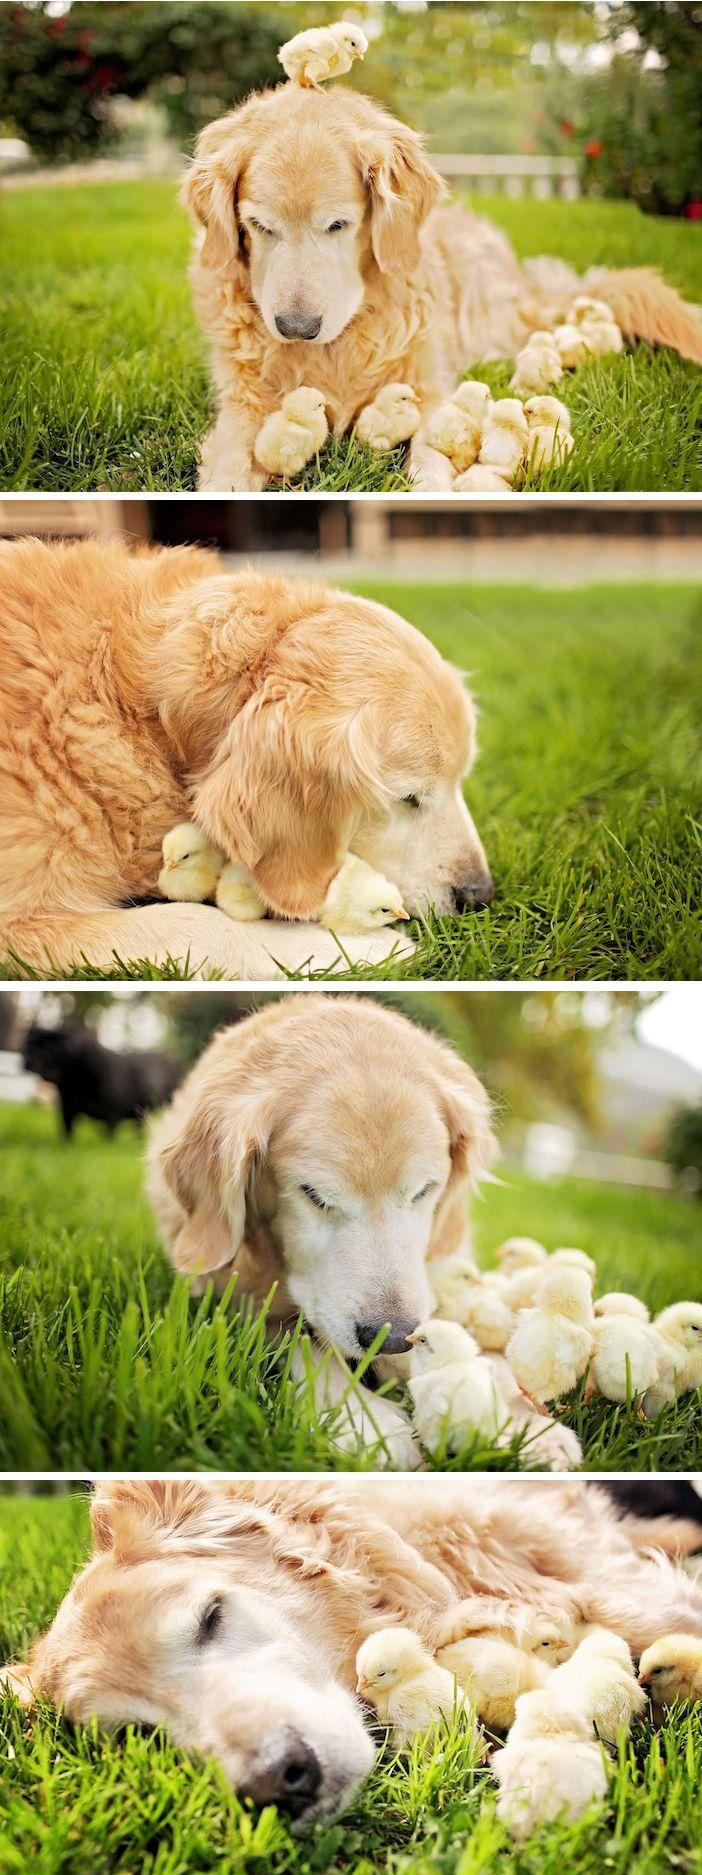 Una madre es siempre una madre, da igual la especie. www.theyellowpet.es